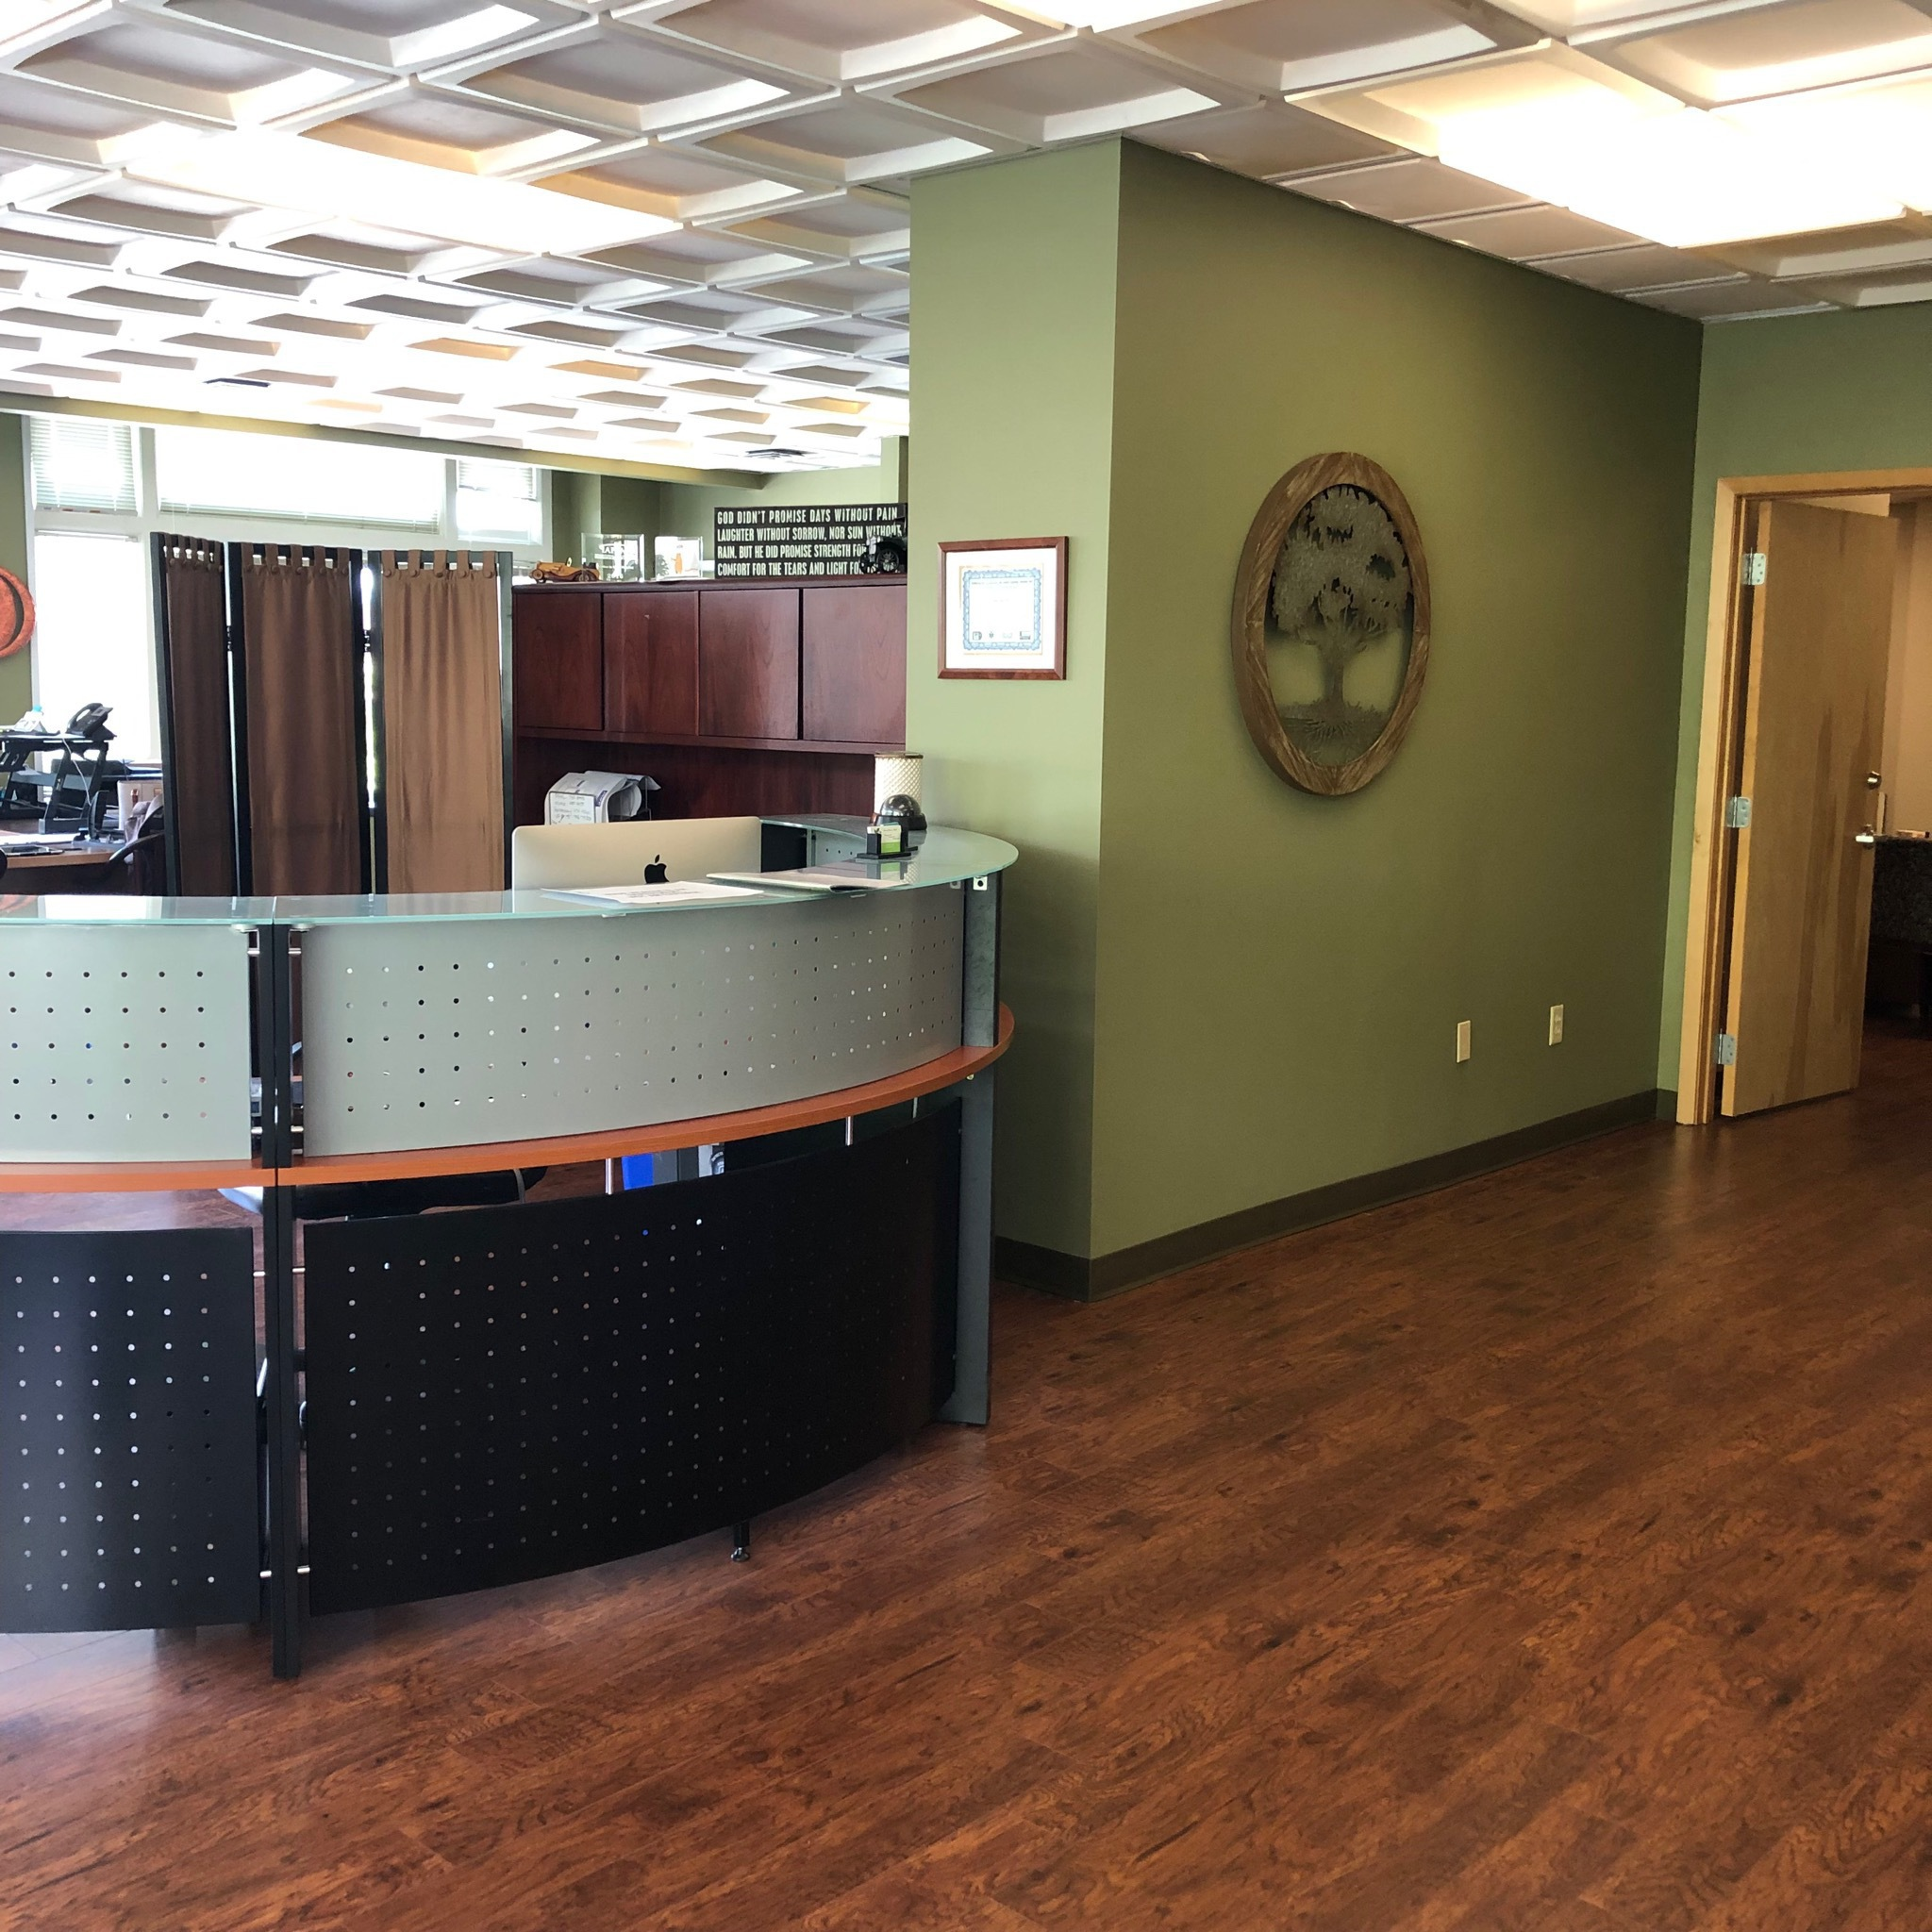 Spokane Suboxone help desk